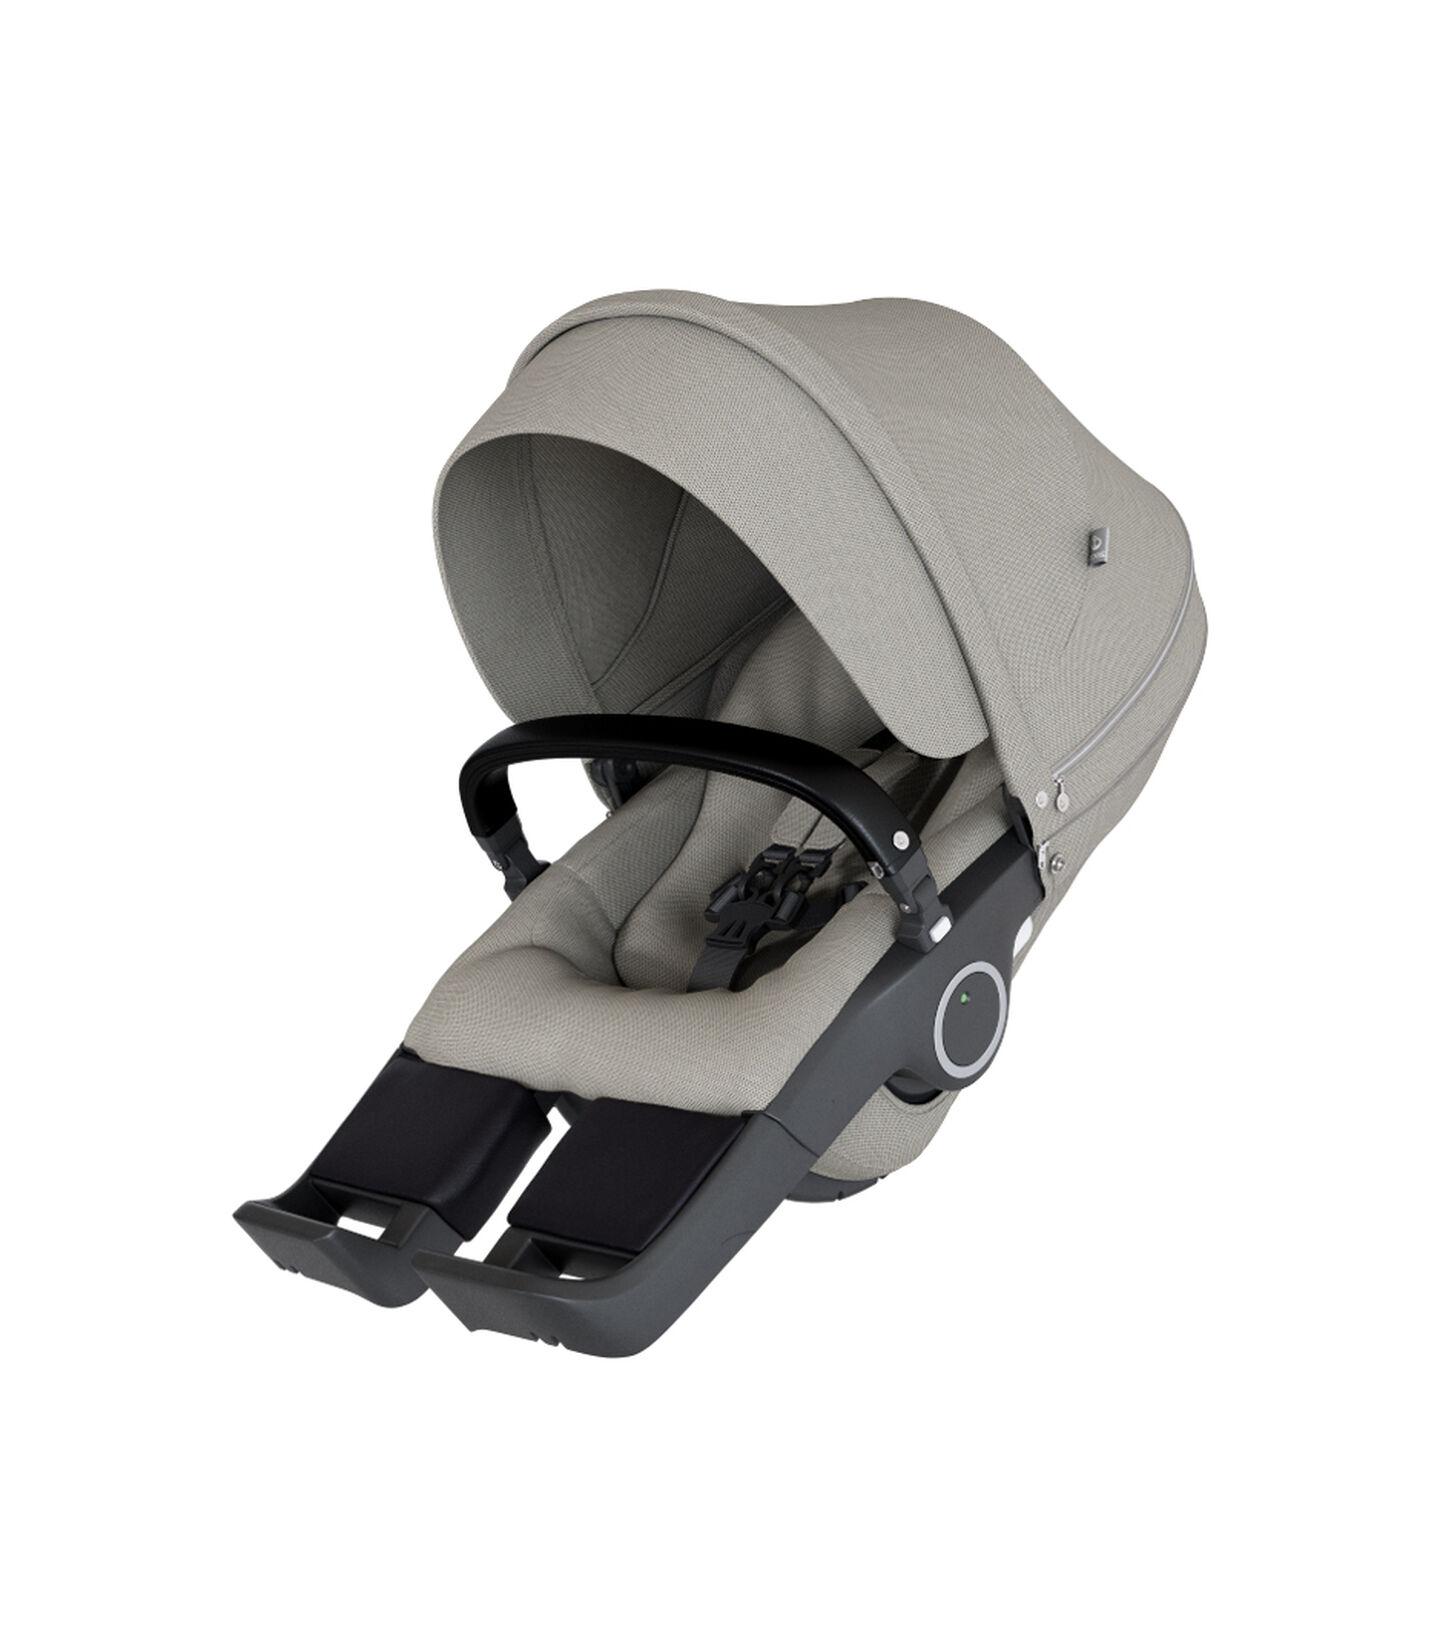 Stokke® Stroller Seat Brushed Grey, Brushed Grey, mainview